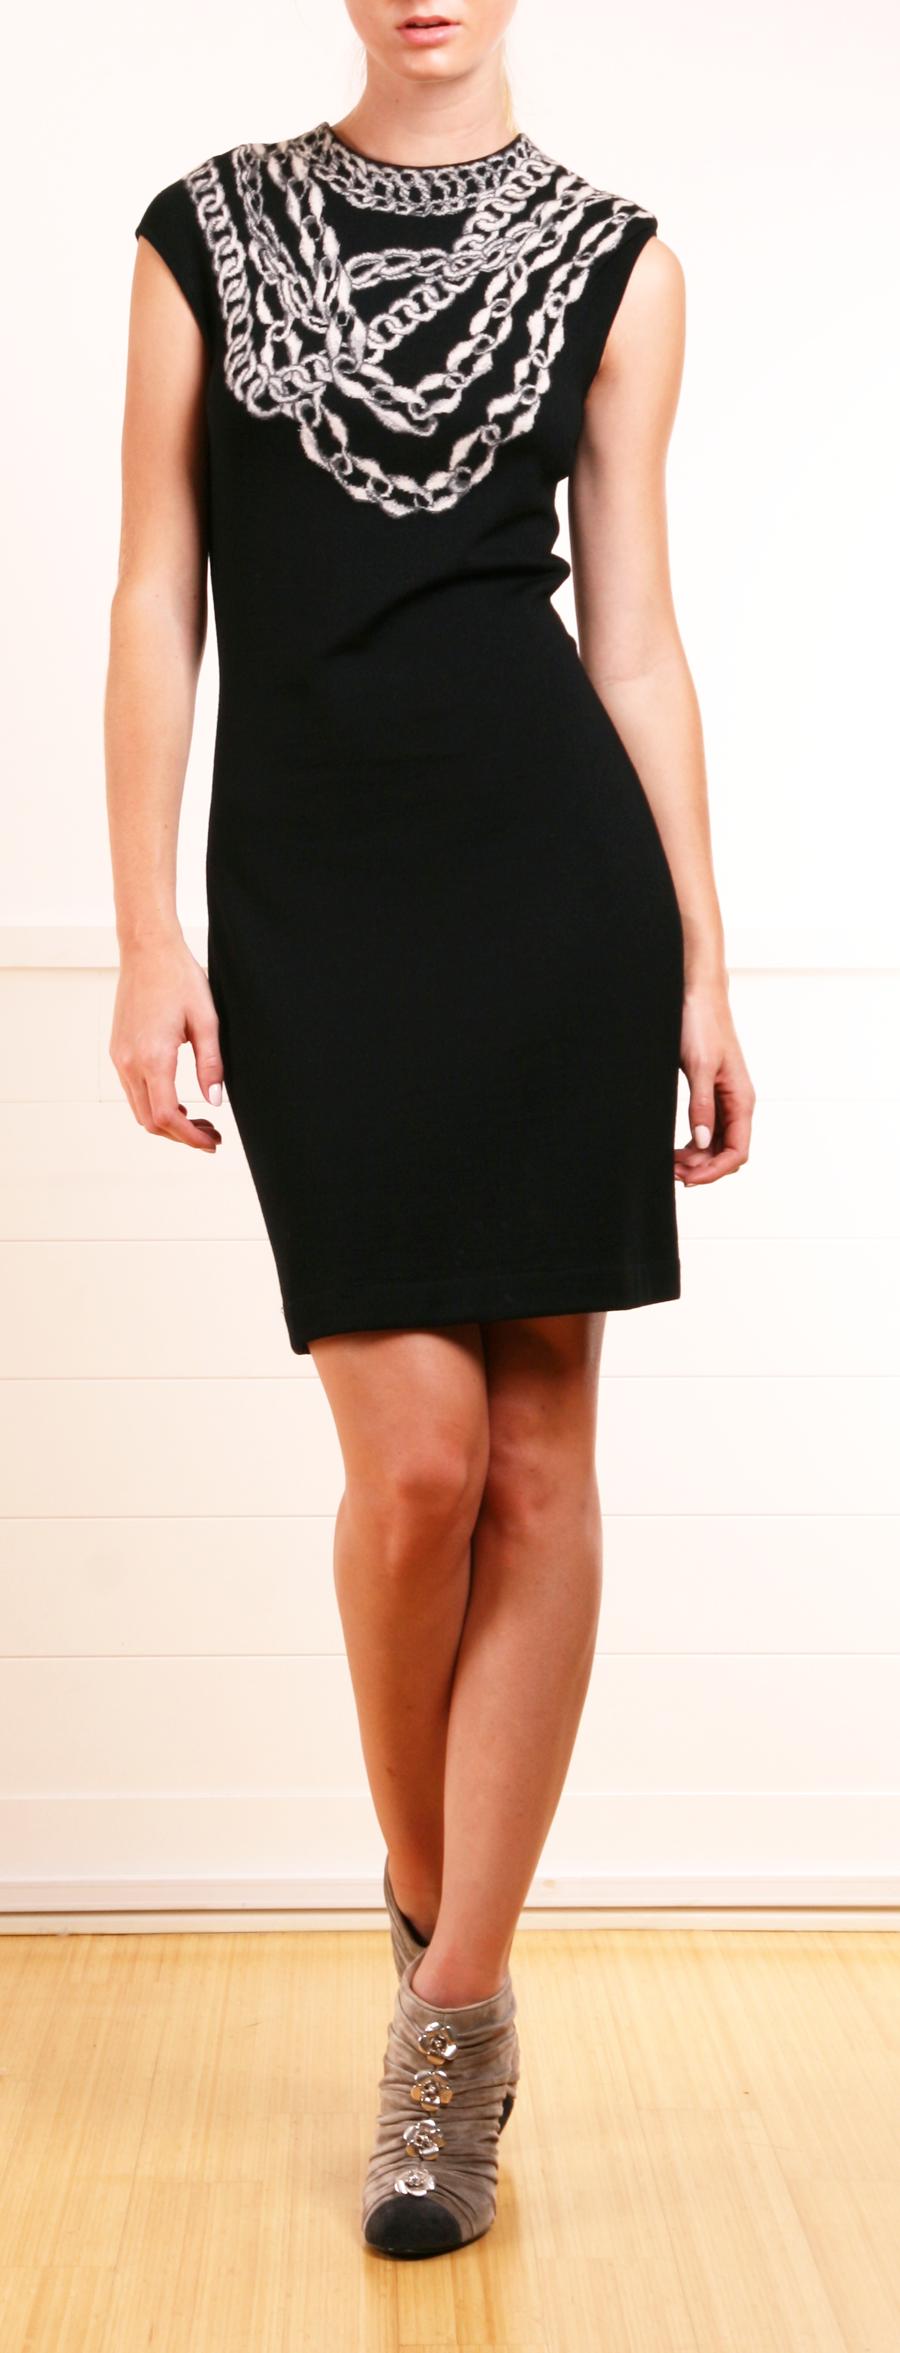 Alexander Mcqueen Dress Alexander Mcqueen Dresses Fashion Mcqueen Fashion [ 2353 x 900 Pixel ]